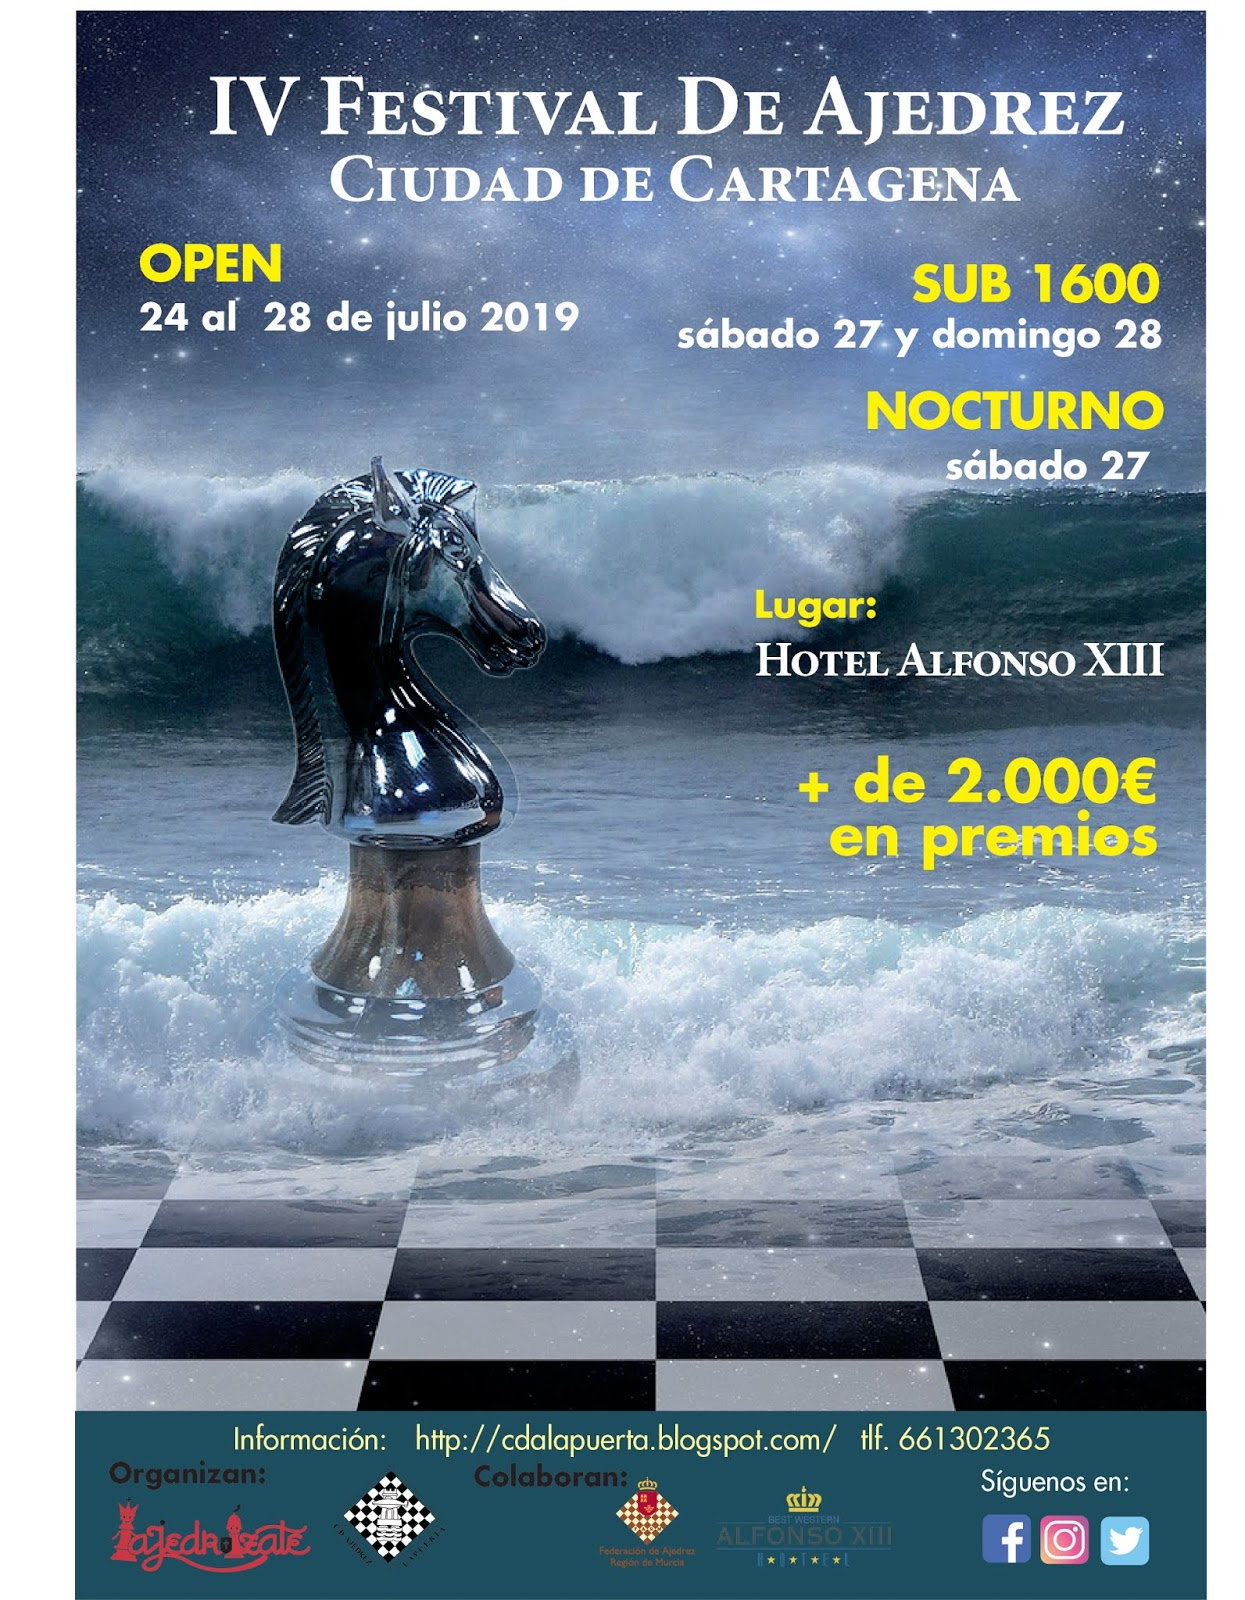 IV Festival de Ajedrez Ciudad de Cartagena